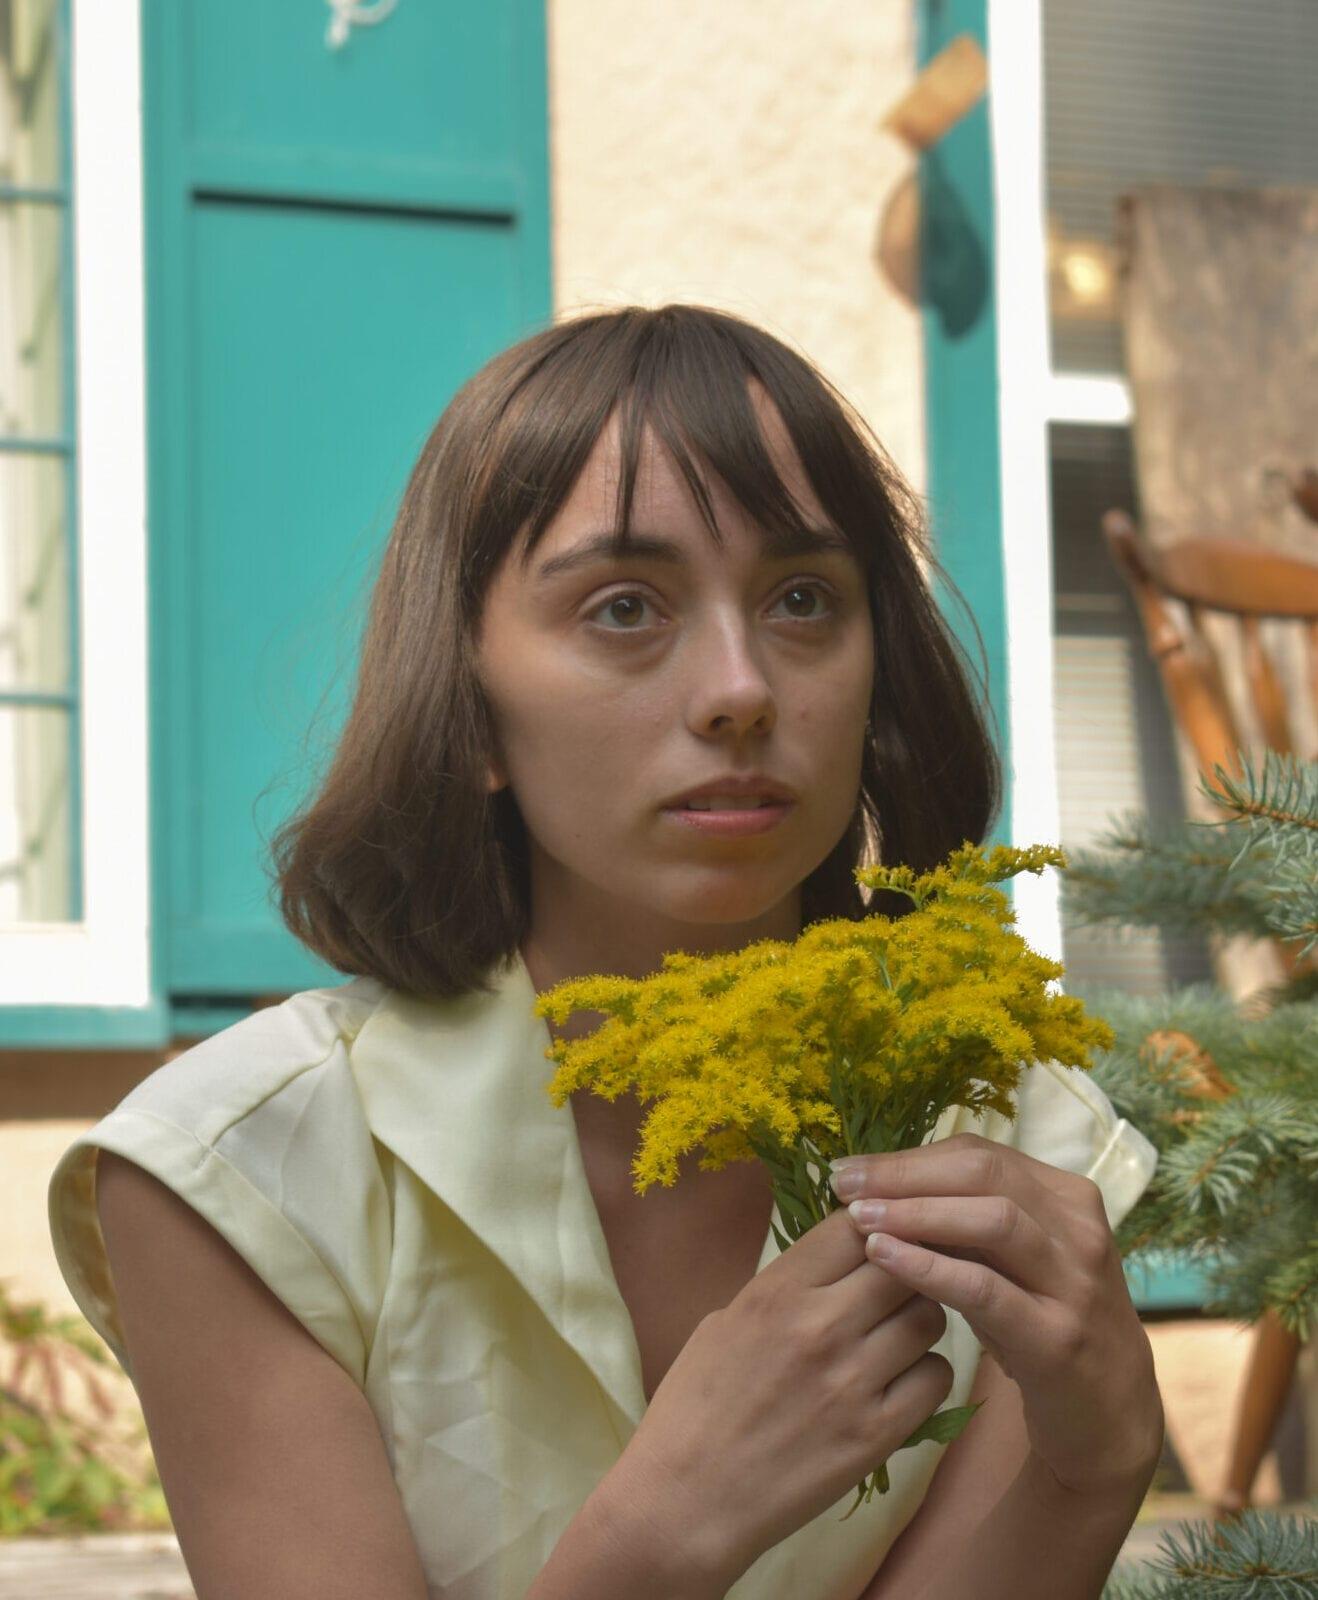 Image Of Ellie Wells, Director Of Eagle Rock, Holding Some Flowers.